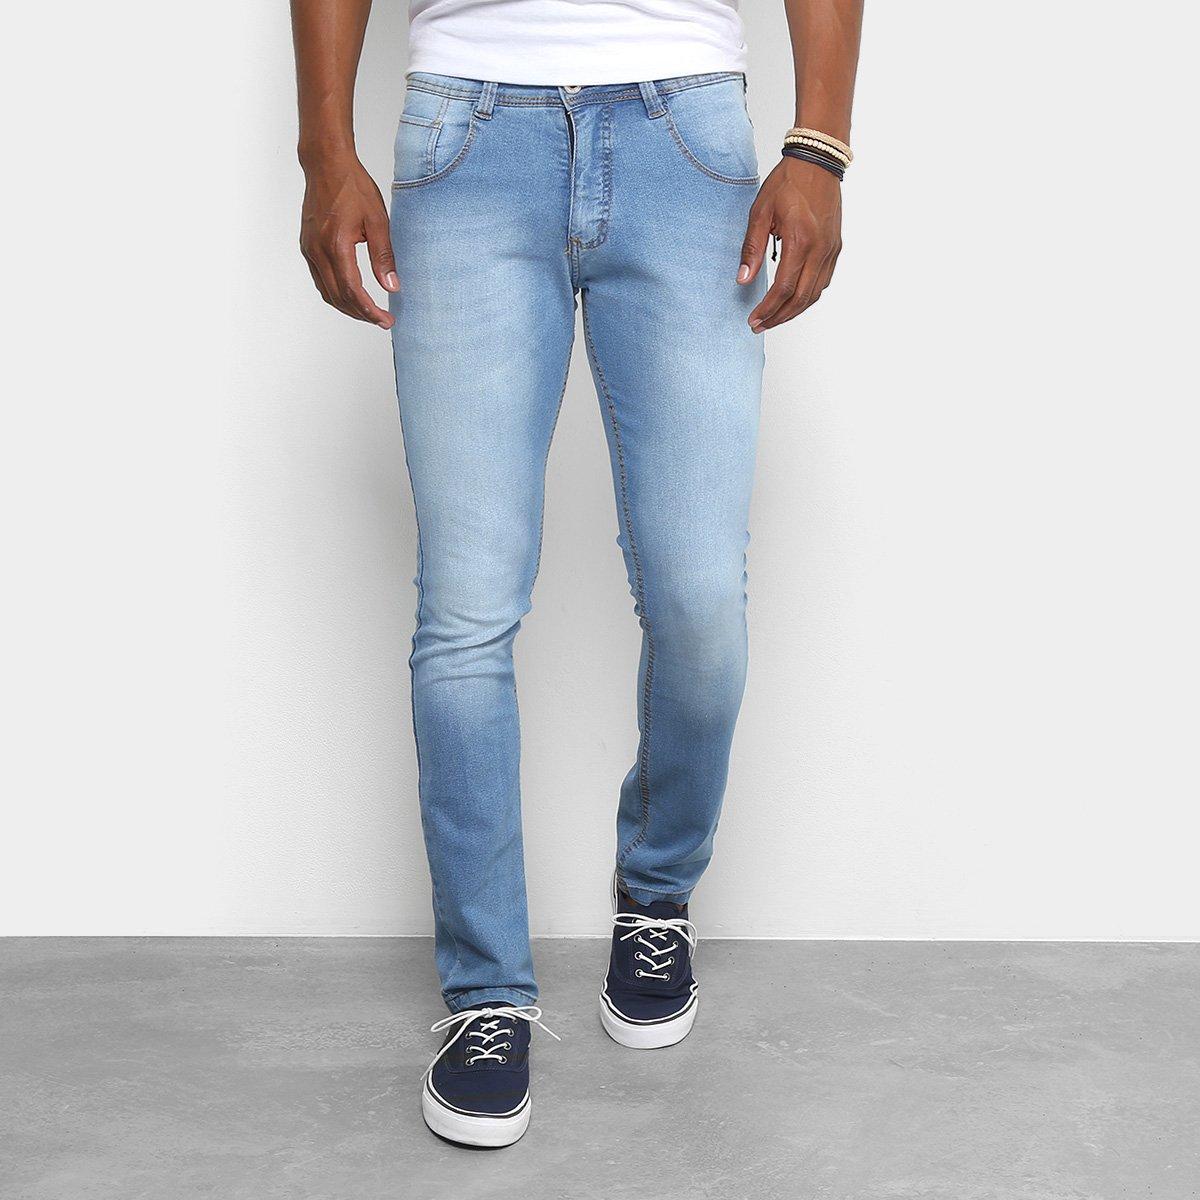 5eb490a175 Calça Jeans Skinny Biotipo Estonada Masculina. undefined